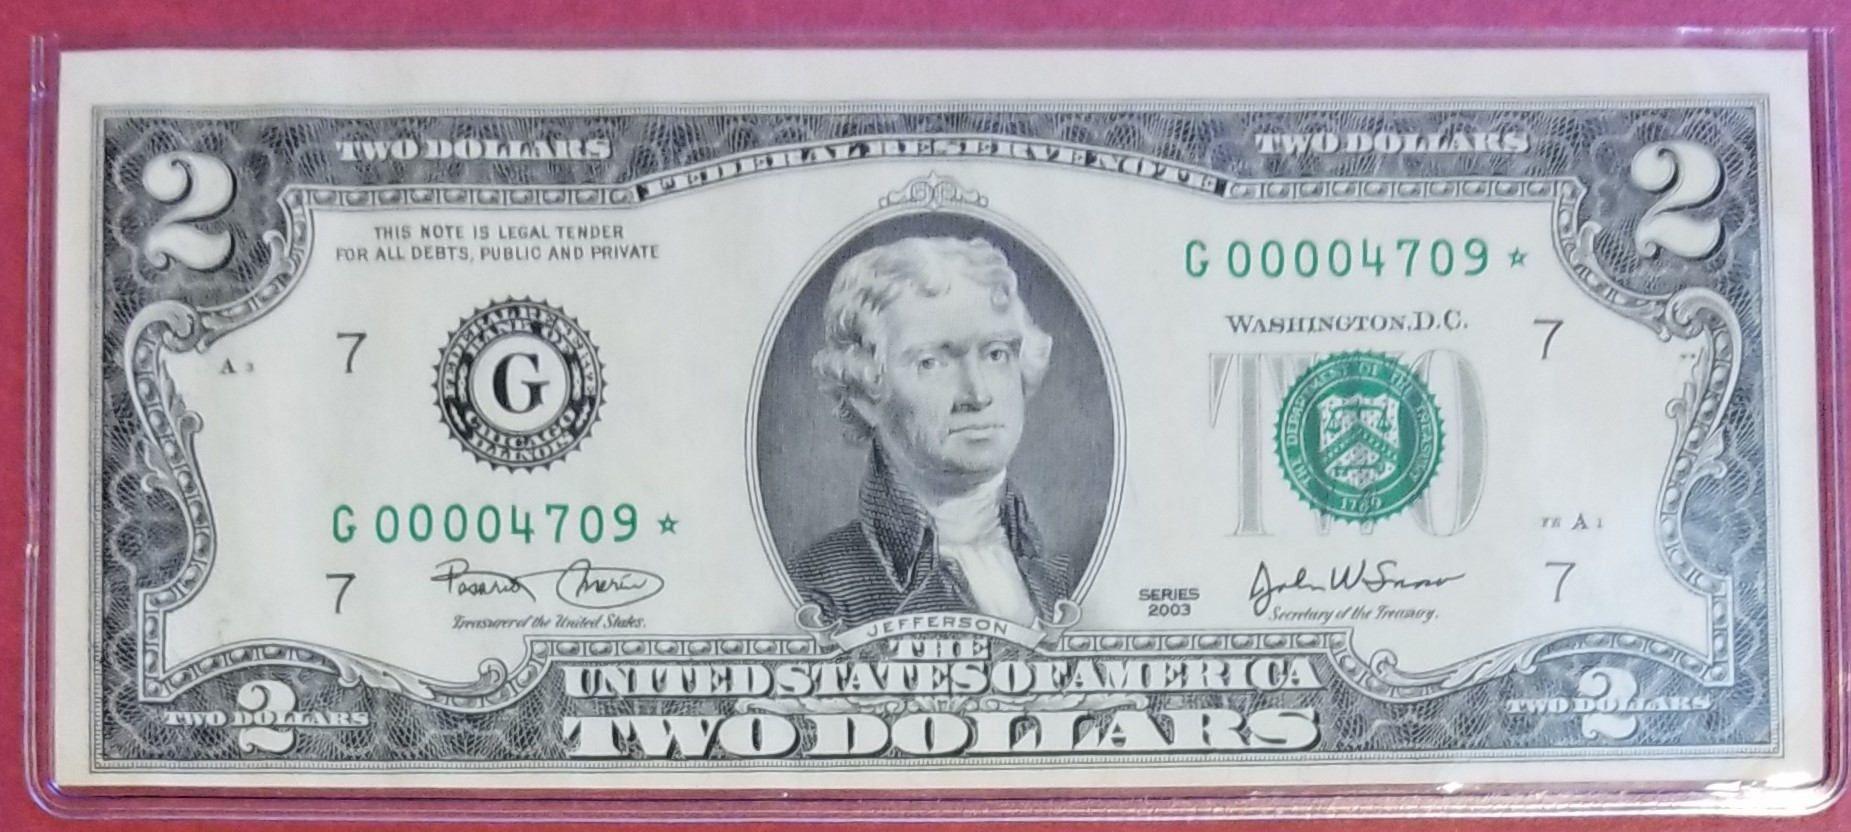 2 2003 $2 Dollar Bill Crisp UNCIRCULATED US BANK NOTES